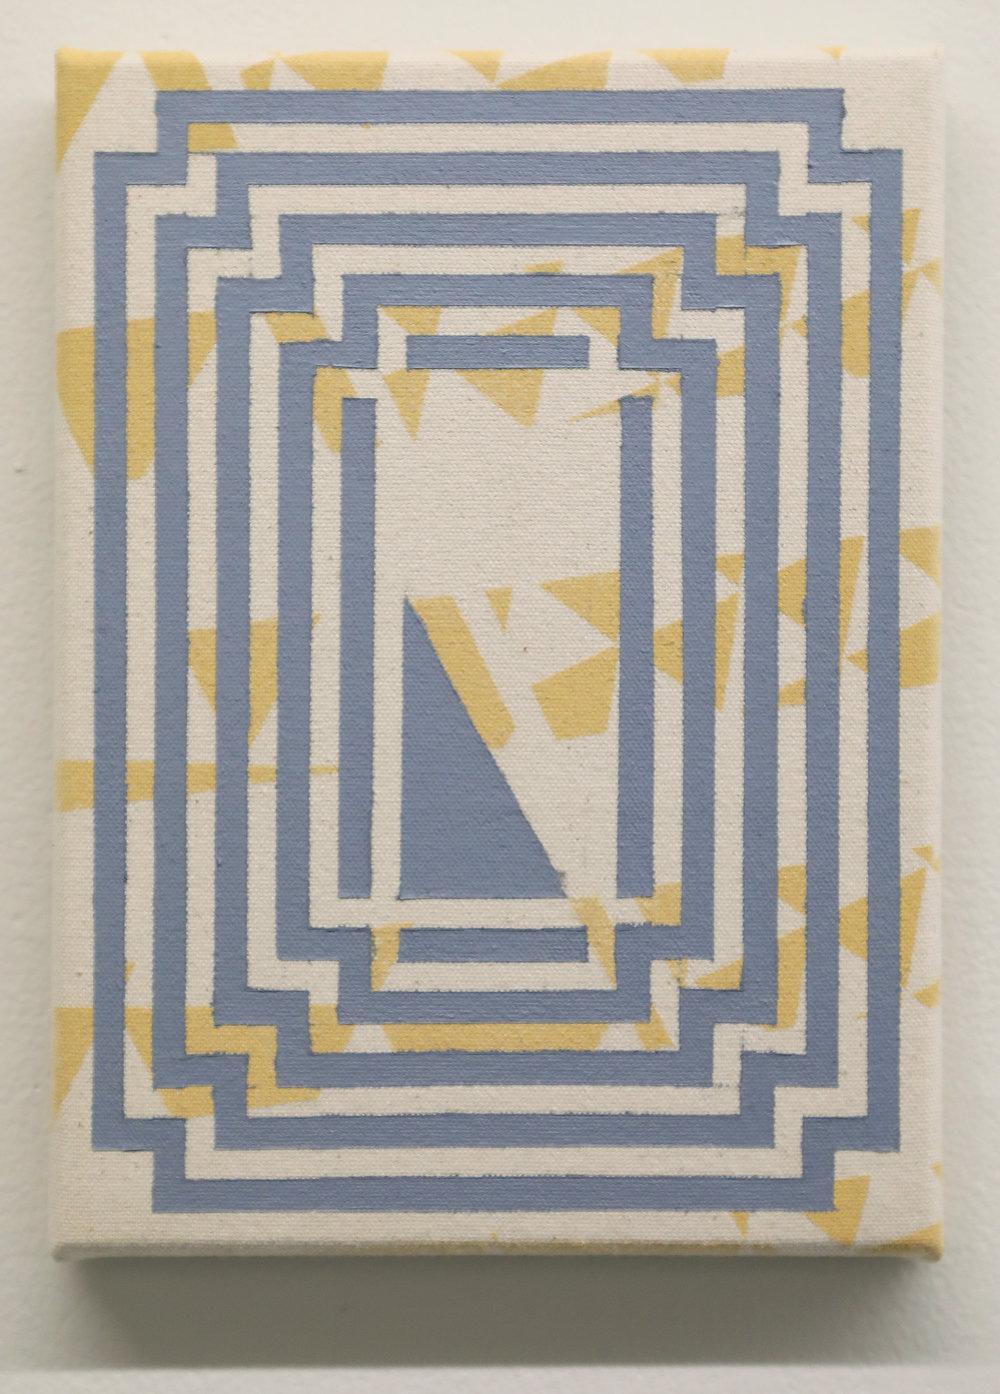 Maze.  Alex McClurg, 2017.